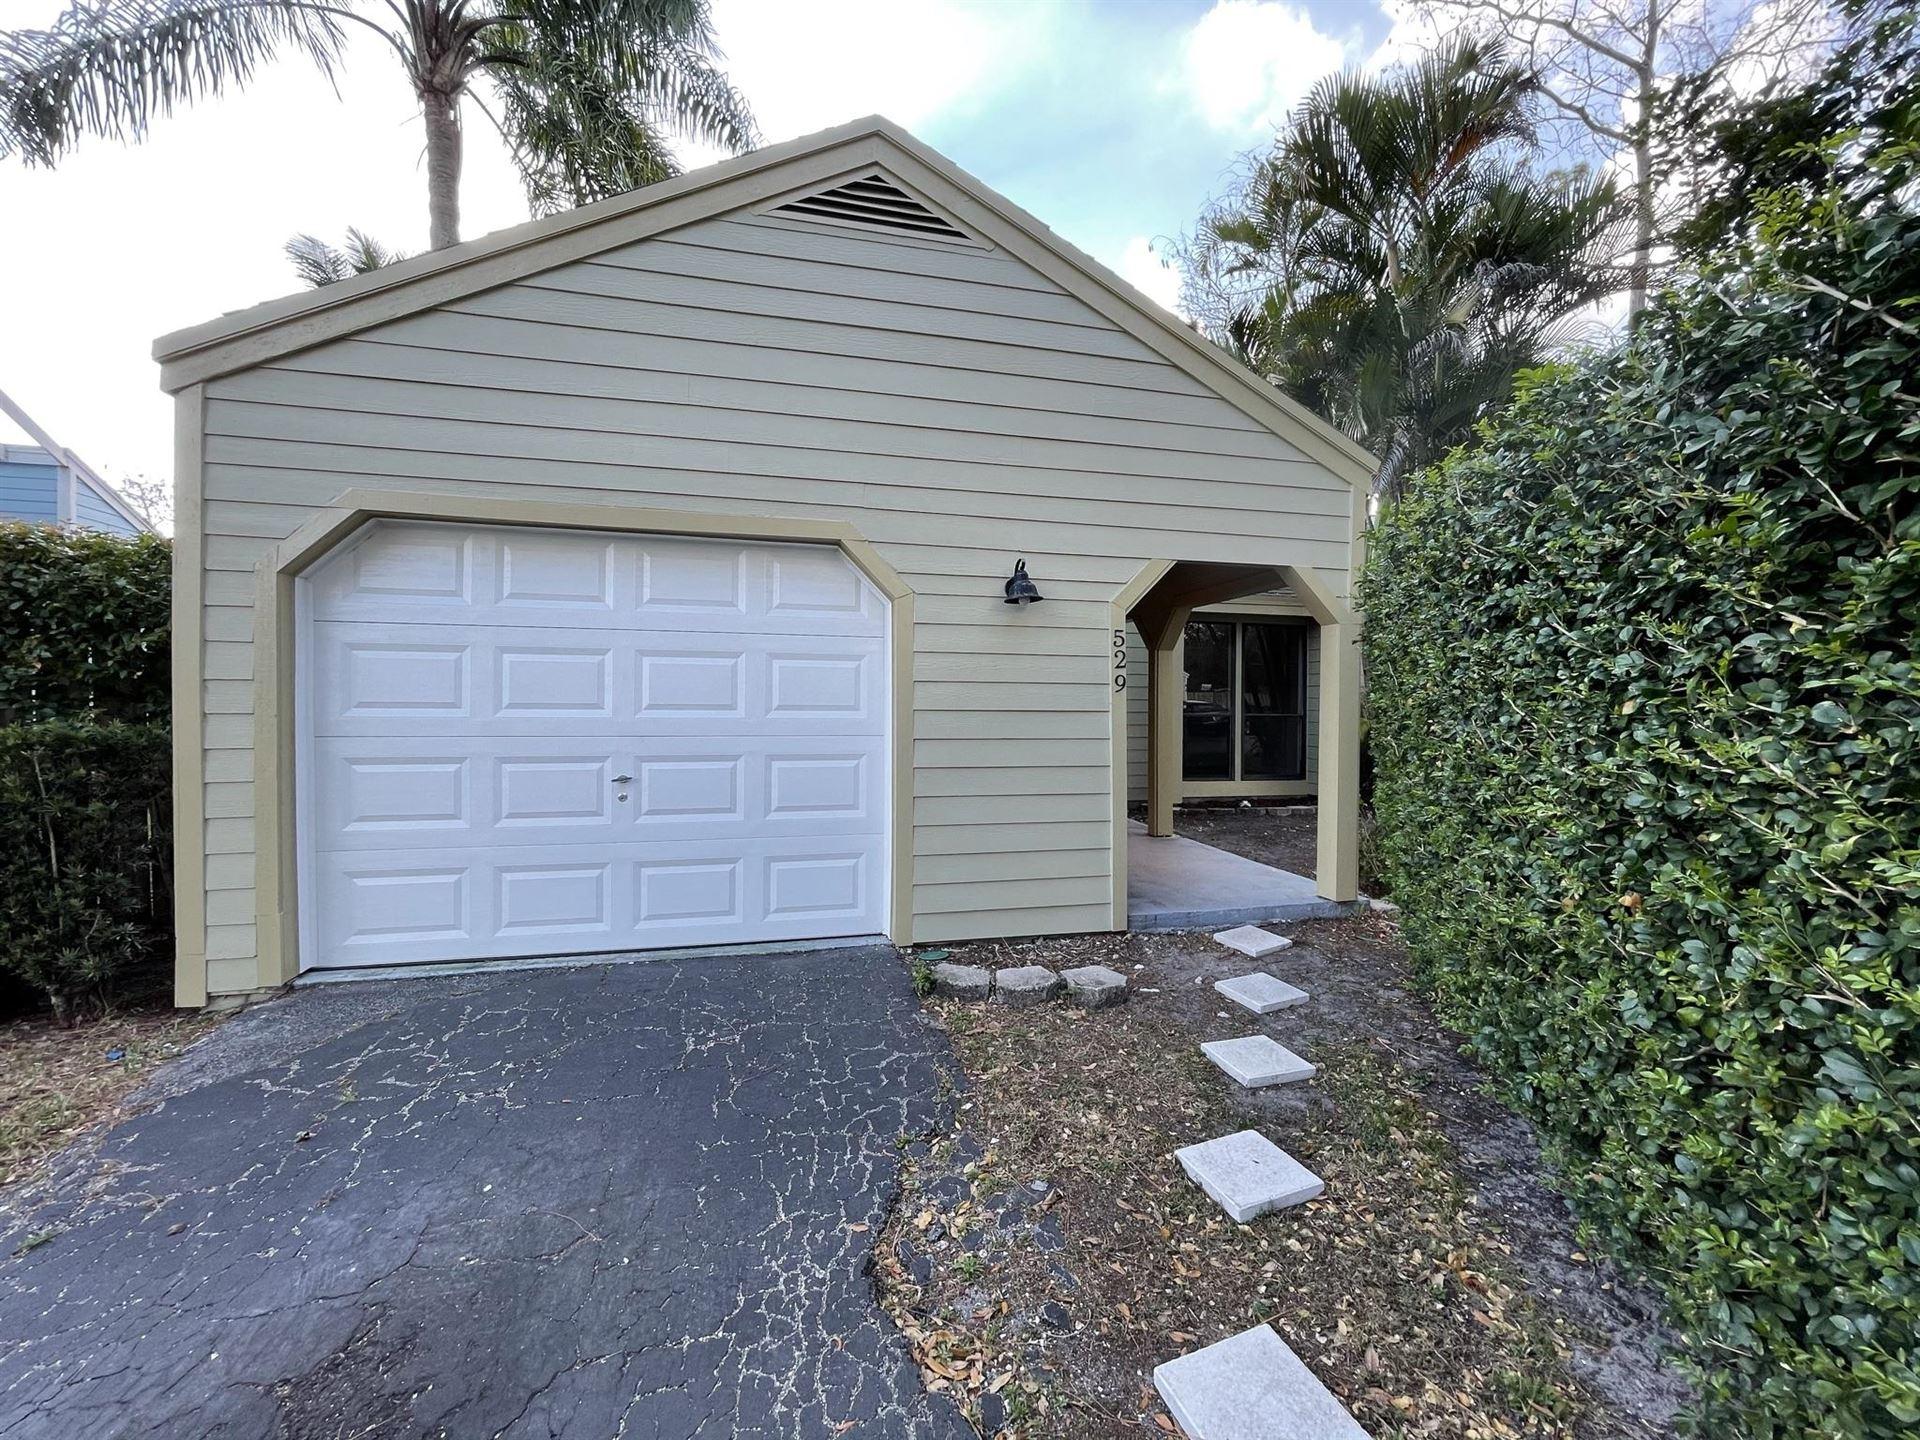 529 Golden Wood Way, Wellington, FL 33414 - #: RX-10692942